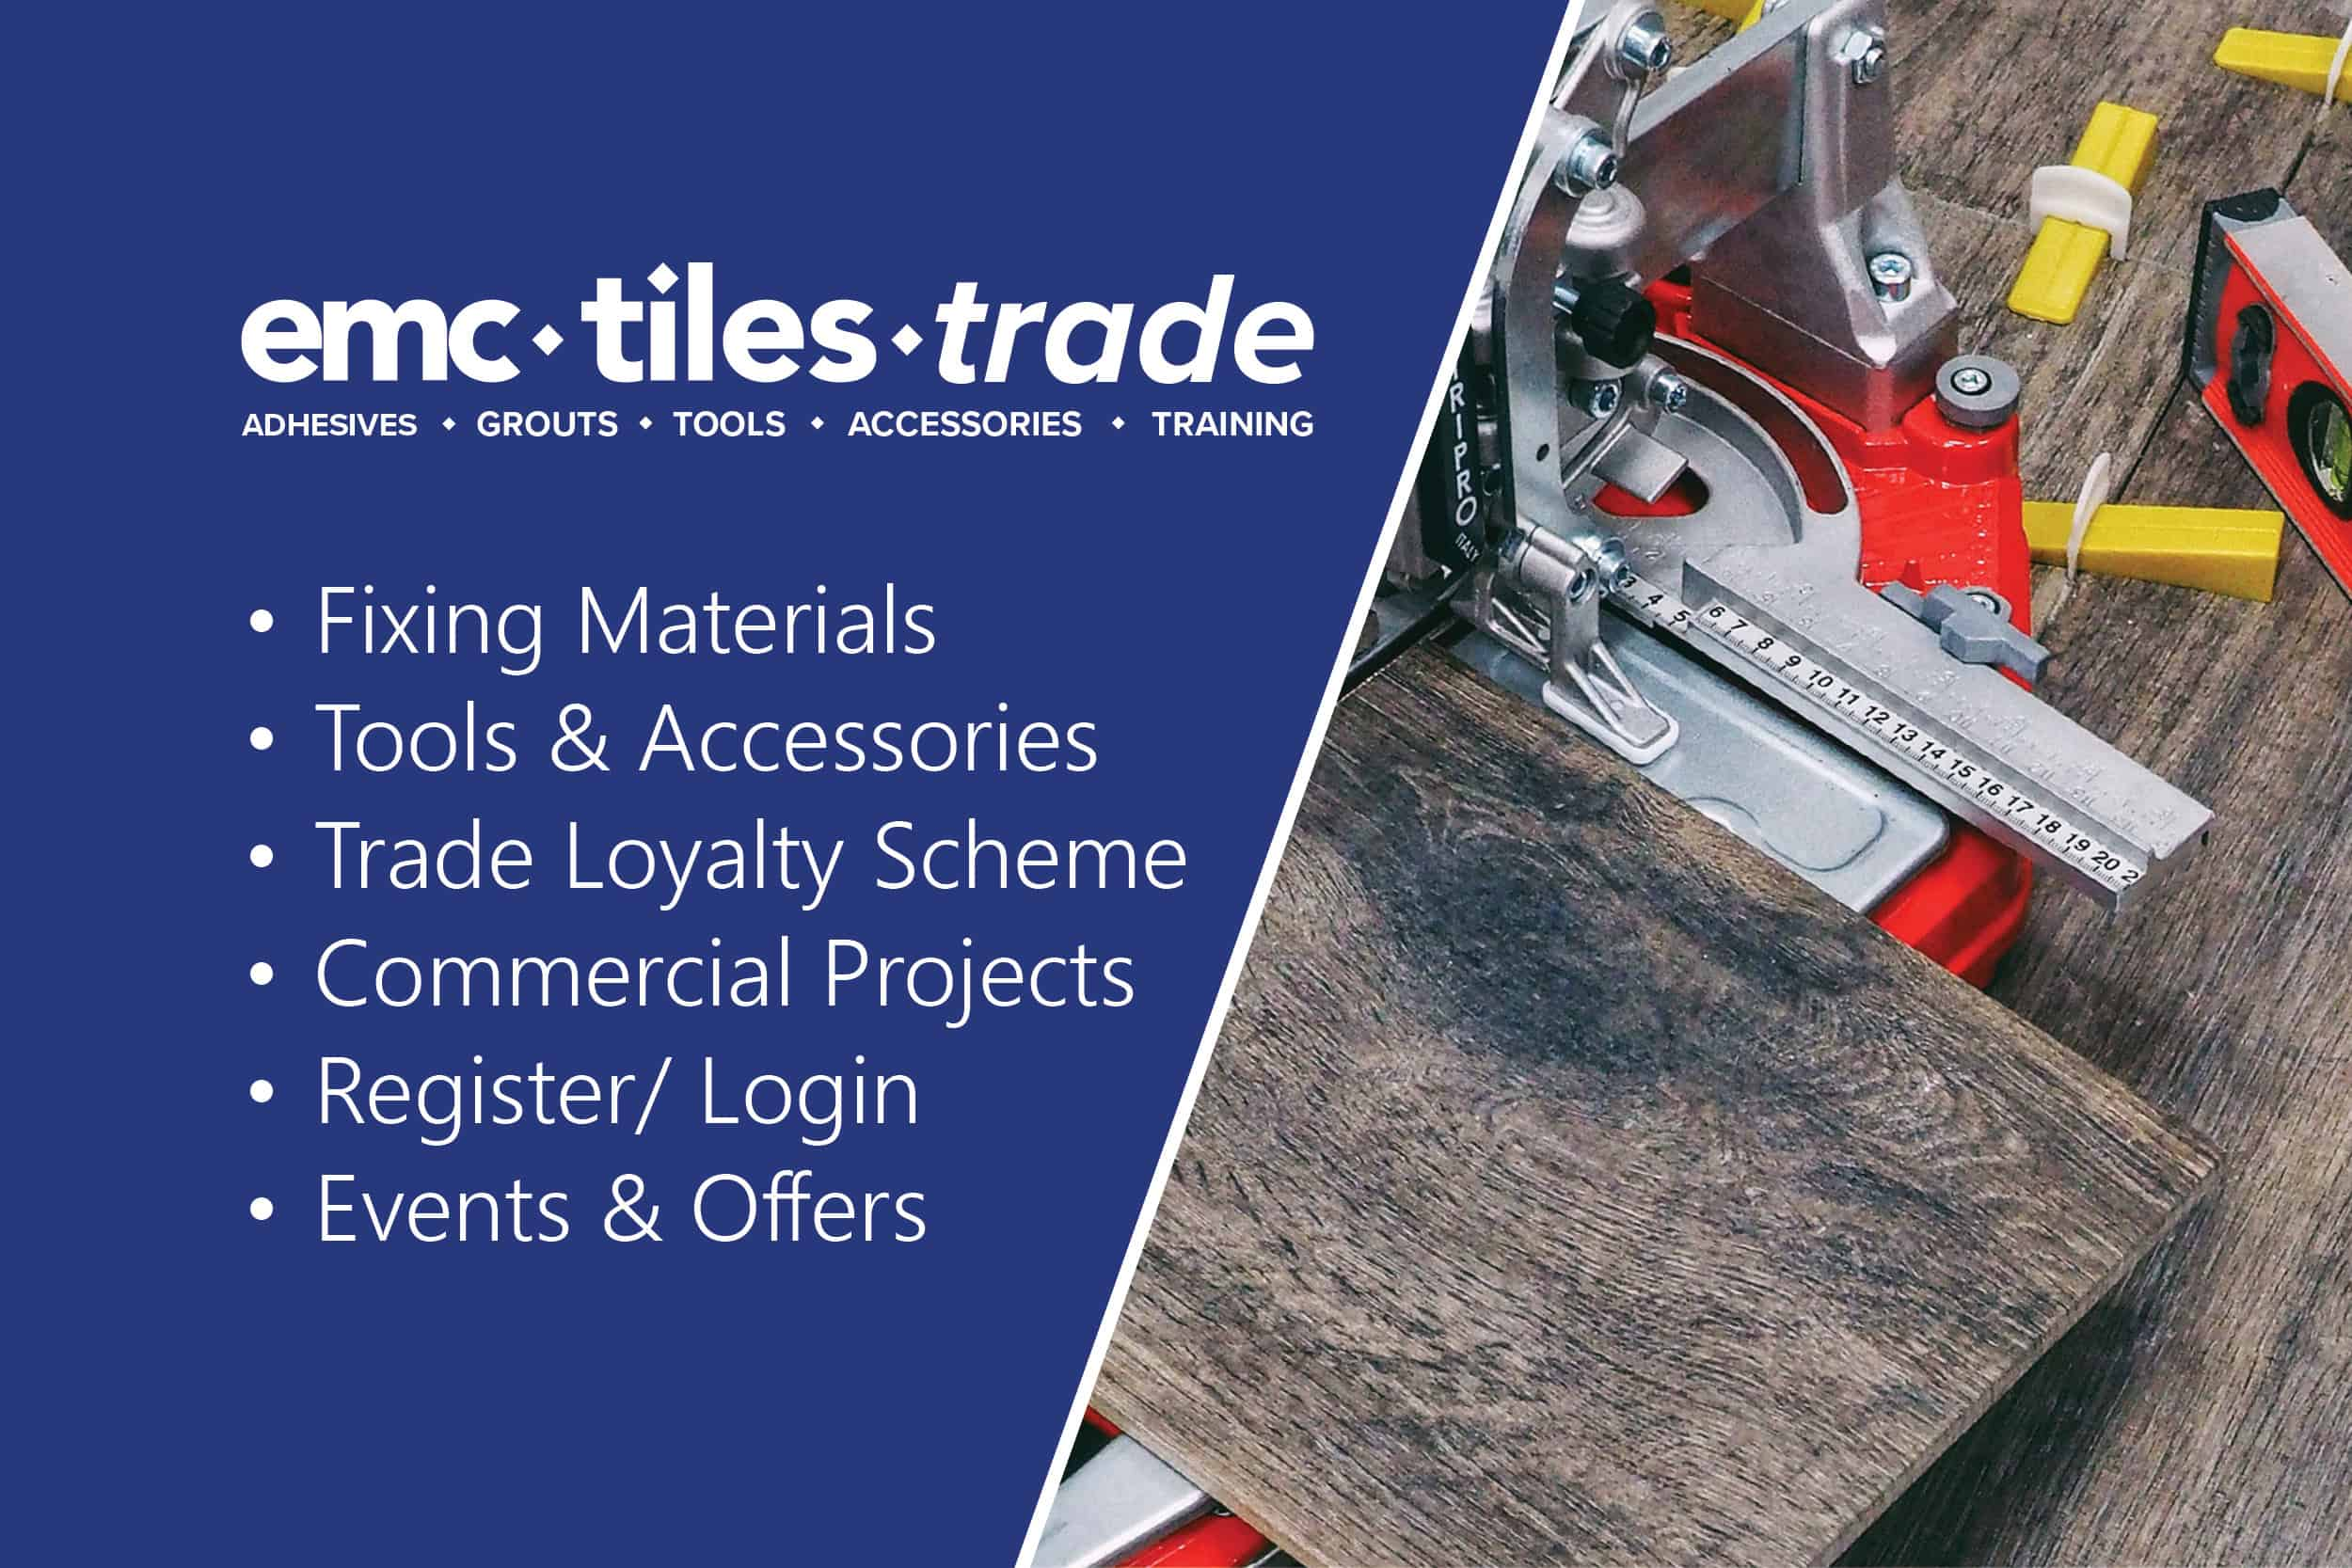 emc tiles trade adhesives, tiling tools, floor wall tiles, clearance, underfloor heating